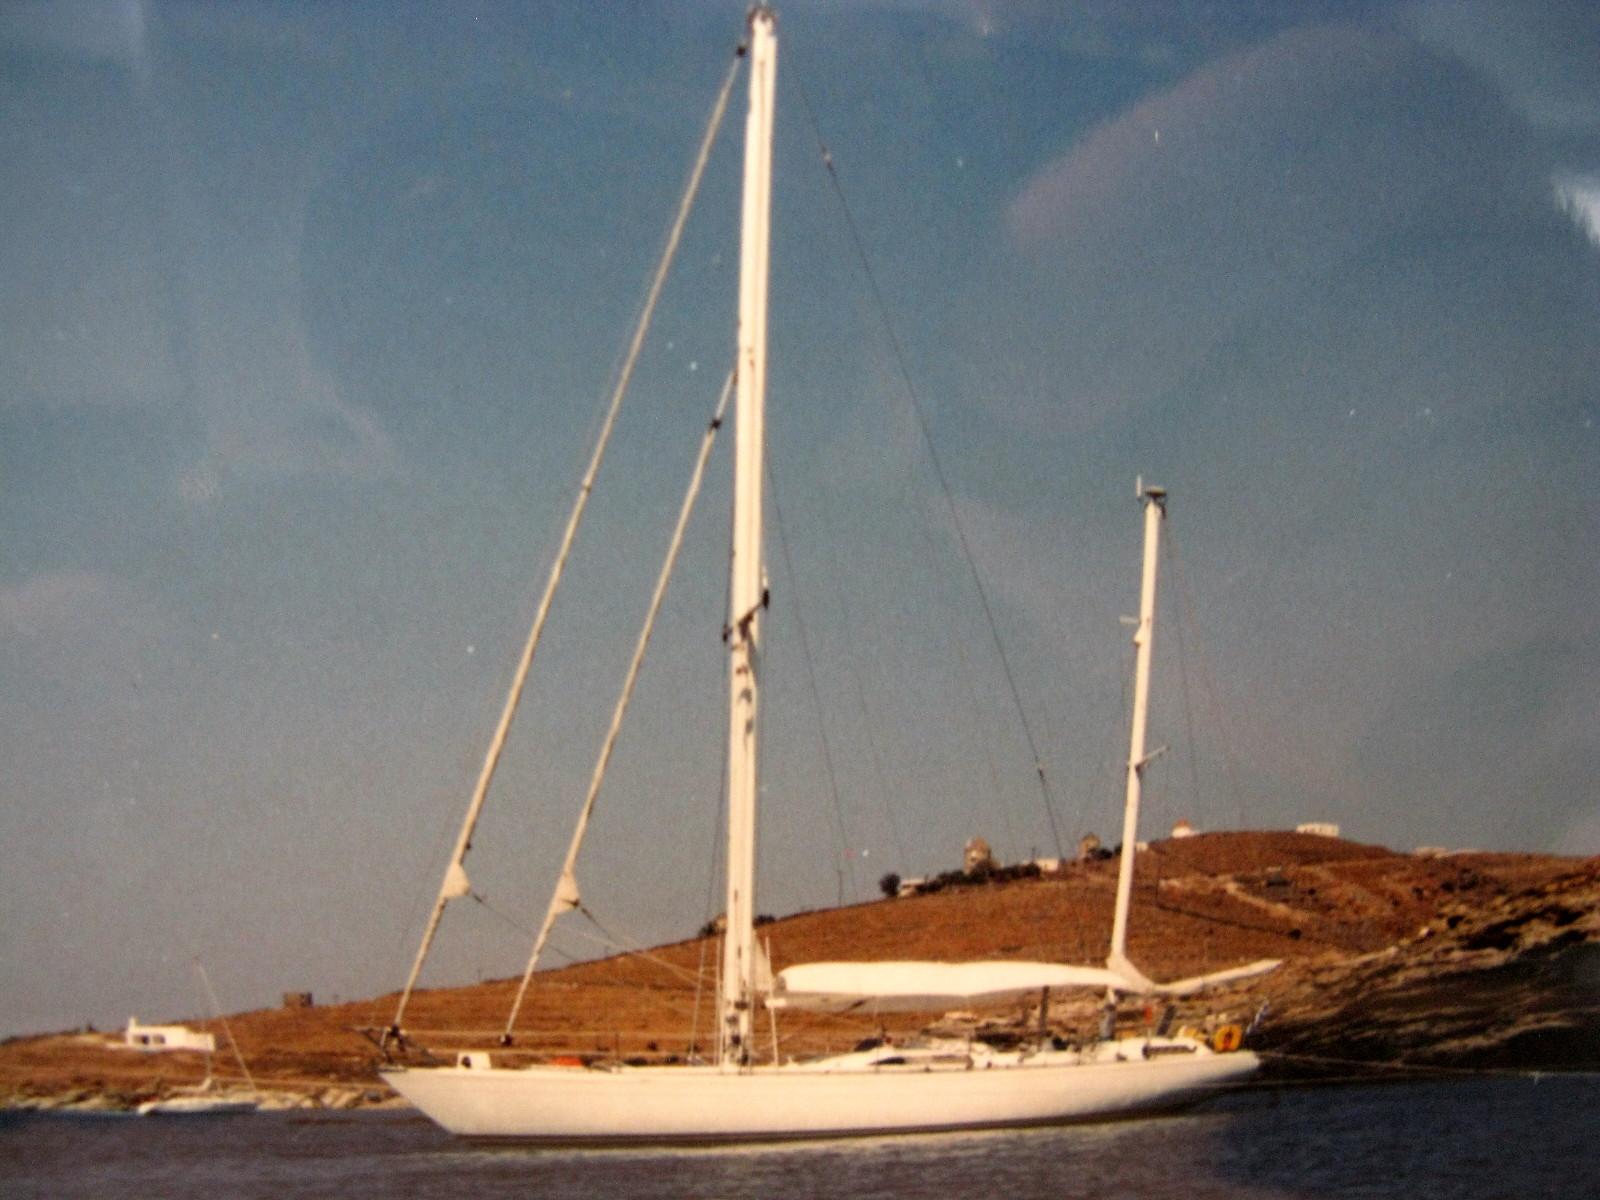 """S/Y Sunny"" a Coala 50 feet cetch built by the Italian Cantieri Navali di Costaguta."